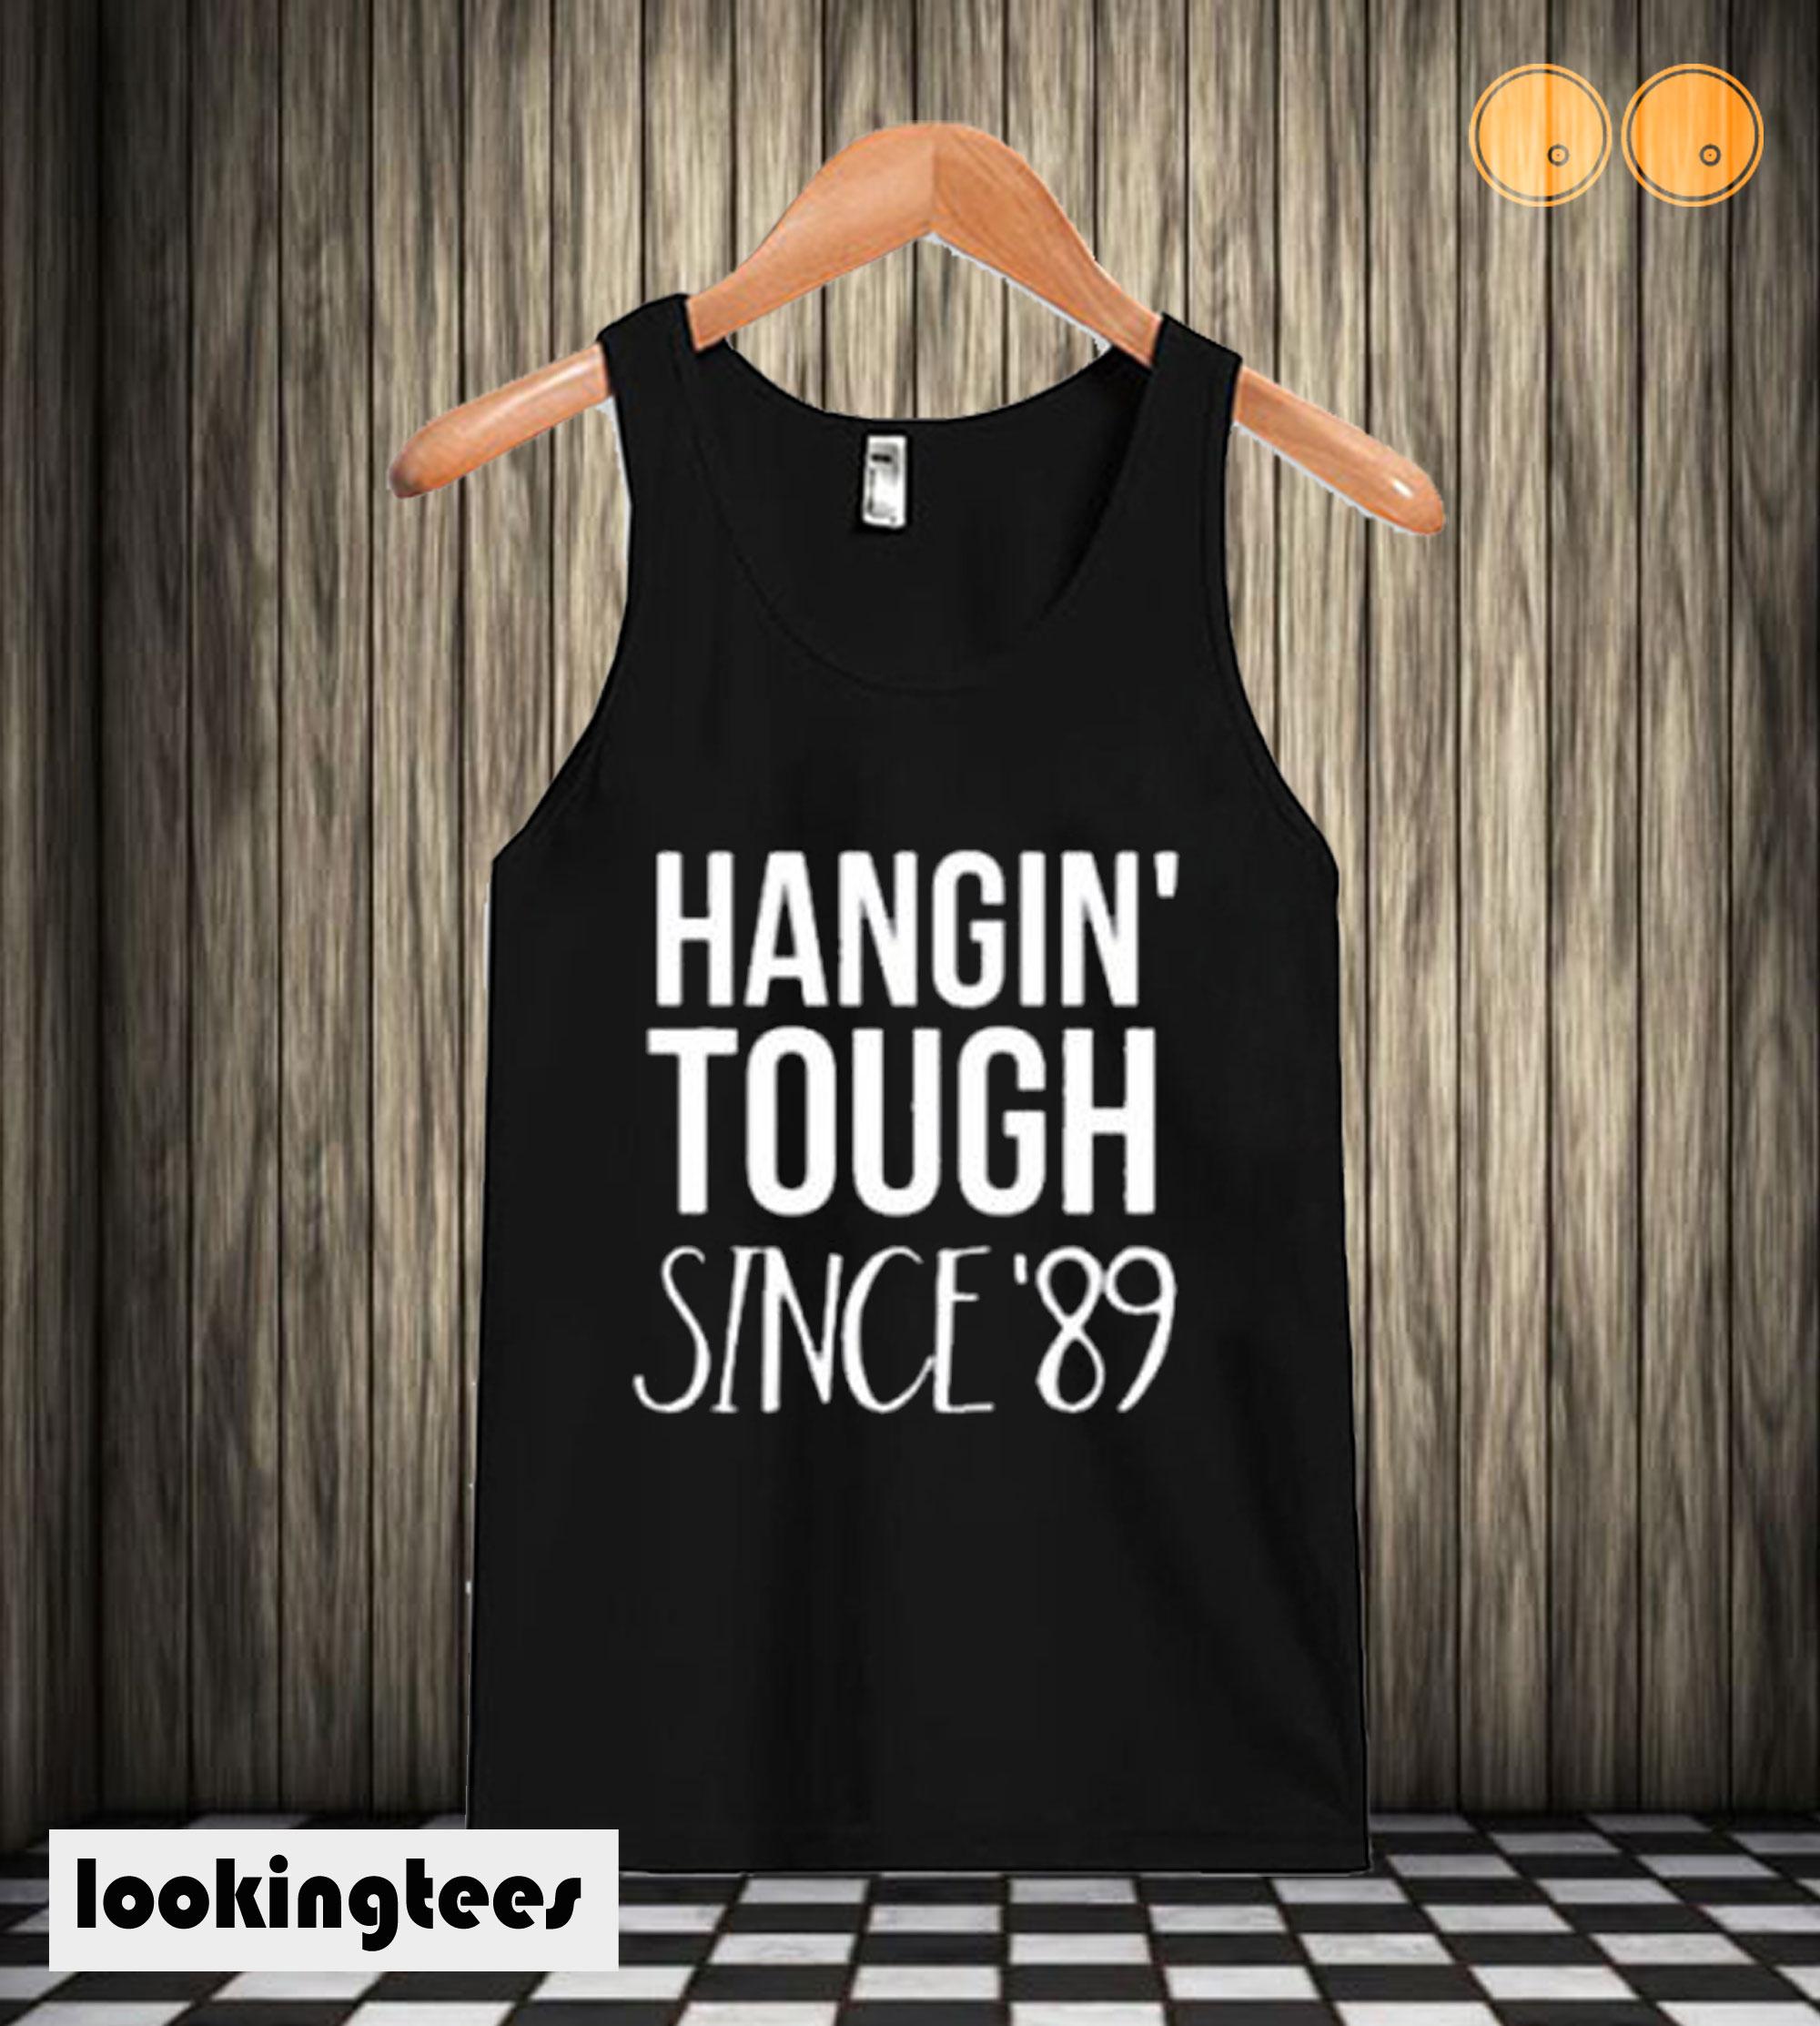 Hangin' Tough Since 89 NKOTB Tanktop